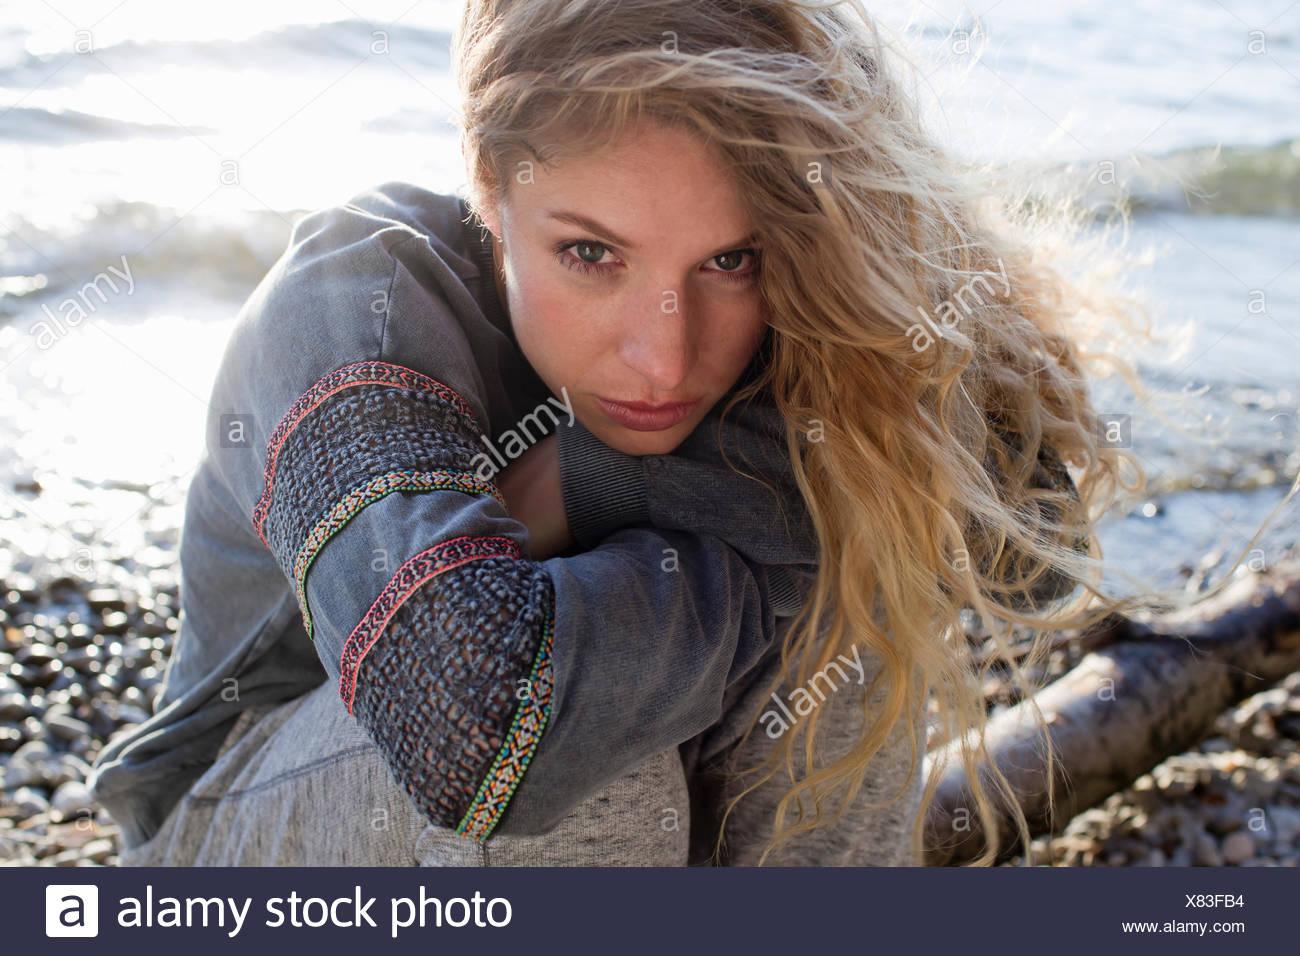 Woman sitting on windy beach - Stock Image